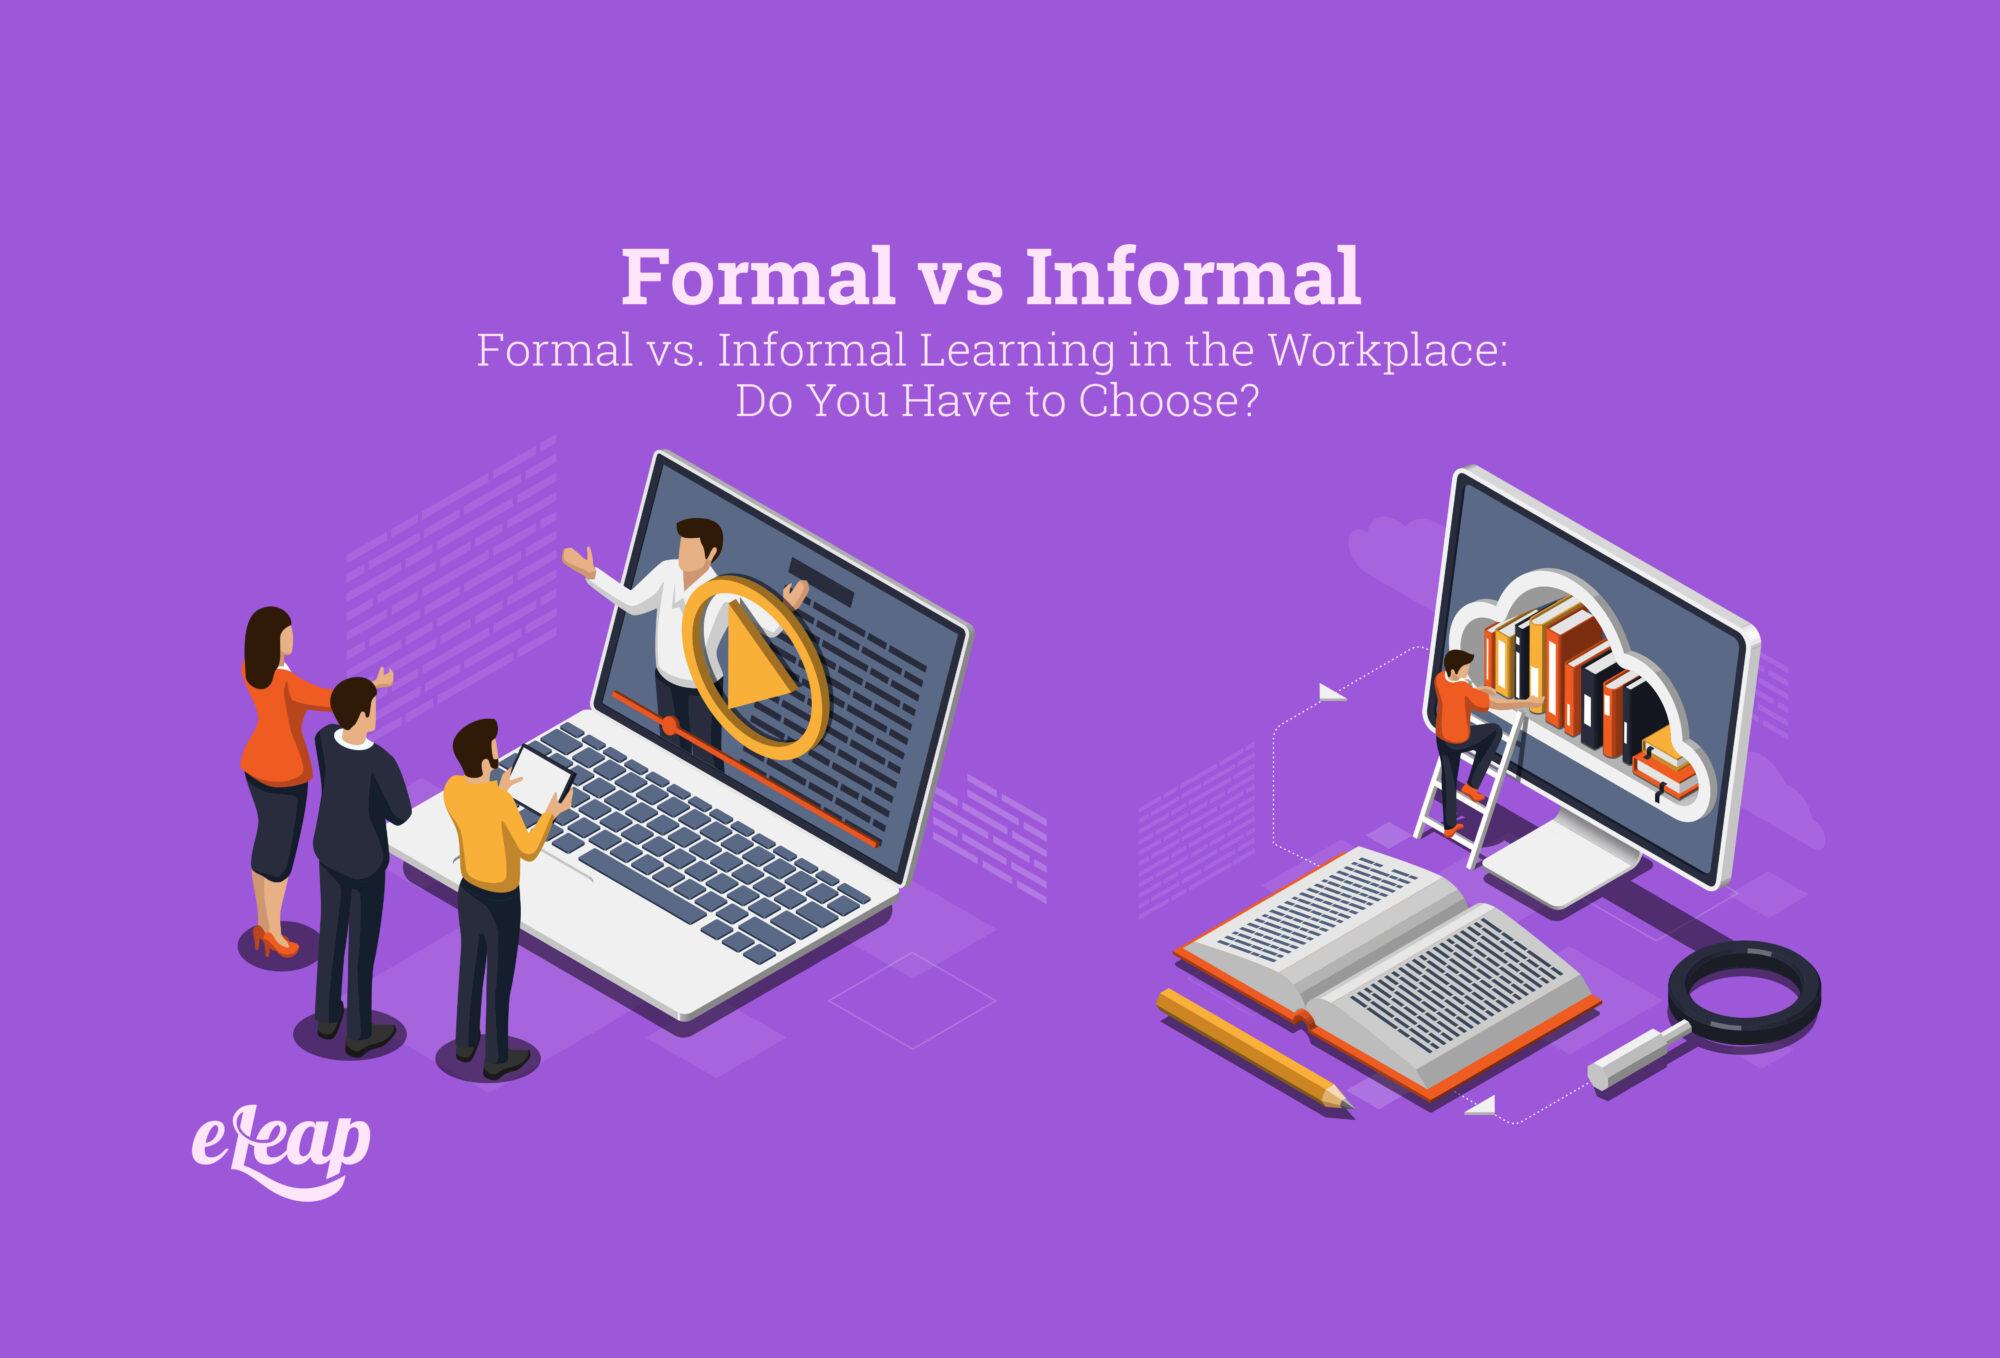 Formal vs Informal Learning